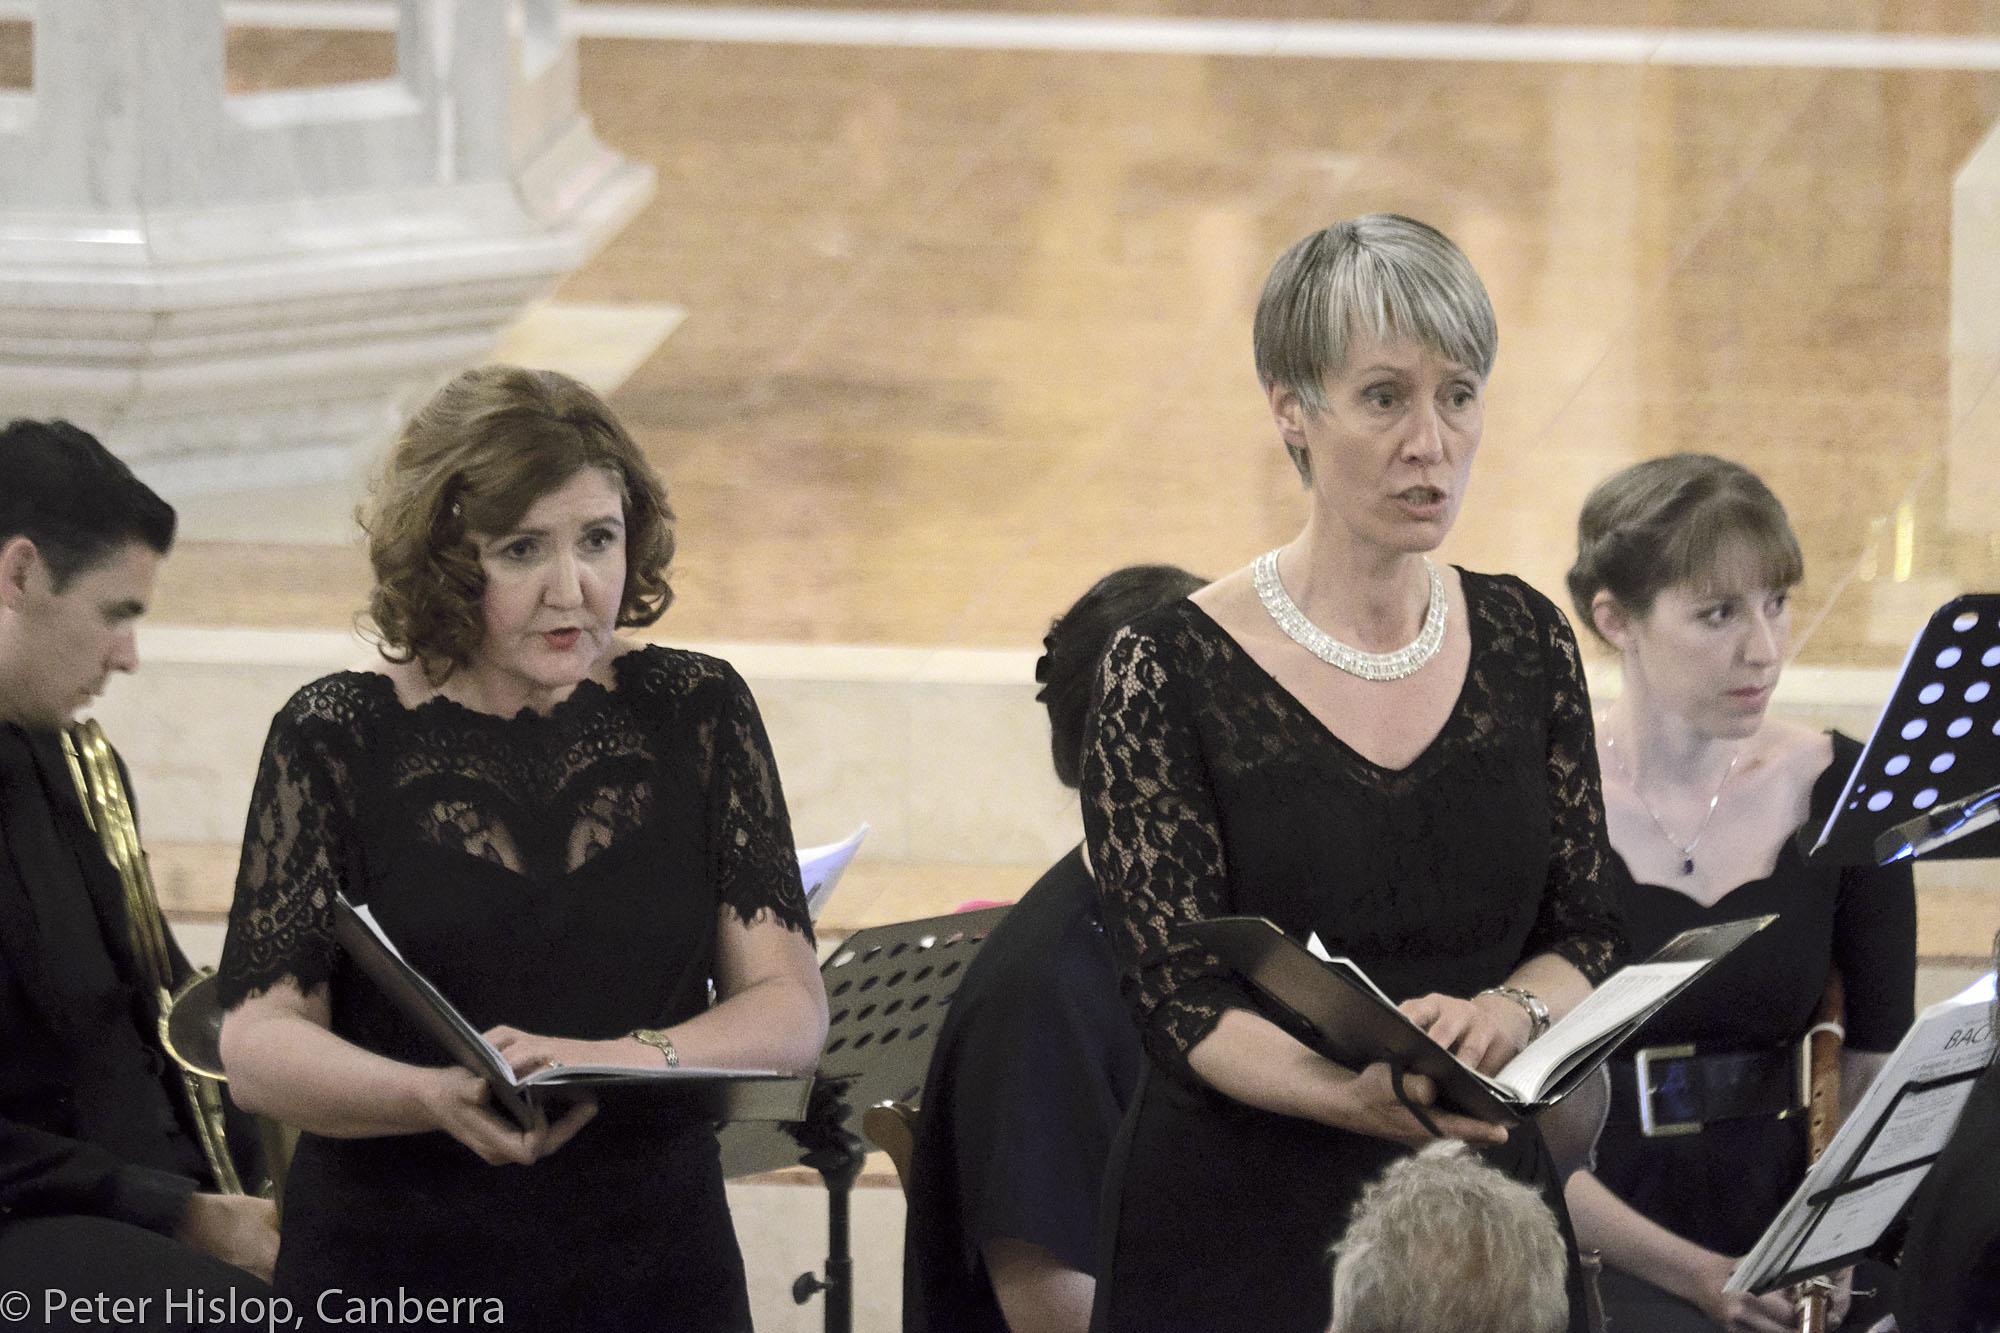 20181027c 014 Canberra Bach Ensemble - O